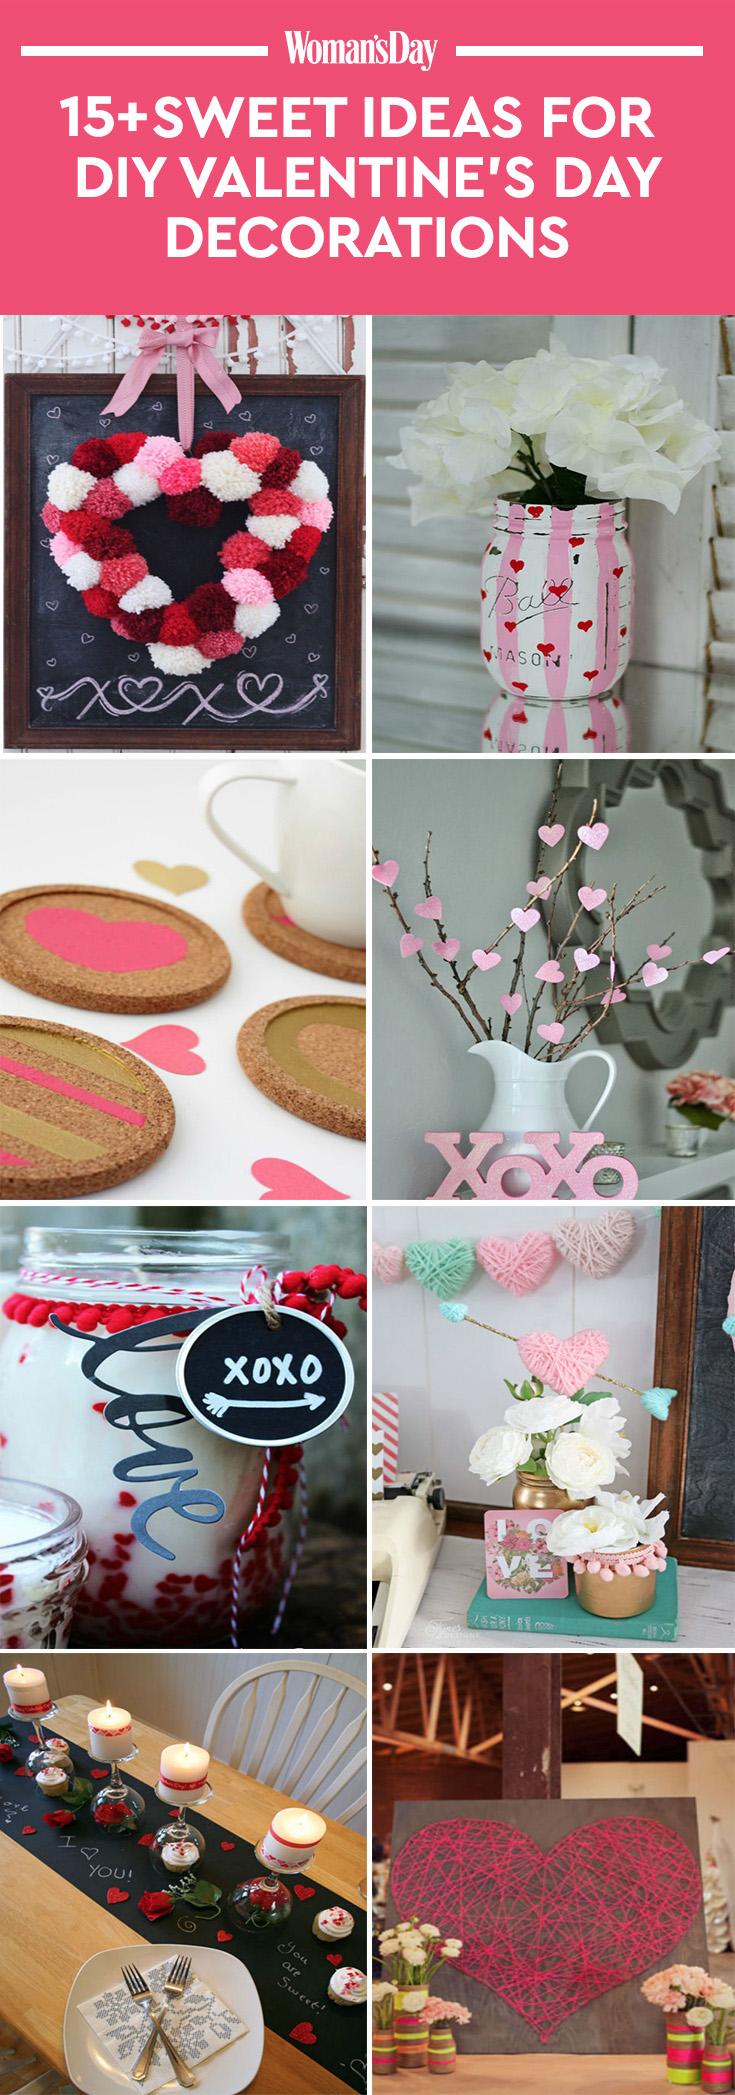 13 DIY Valentines Day Decorations Easy Valentines Day